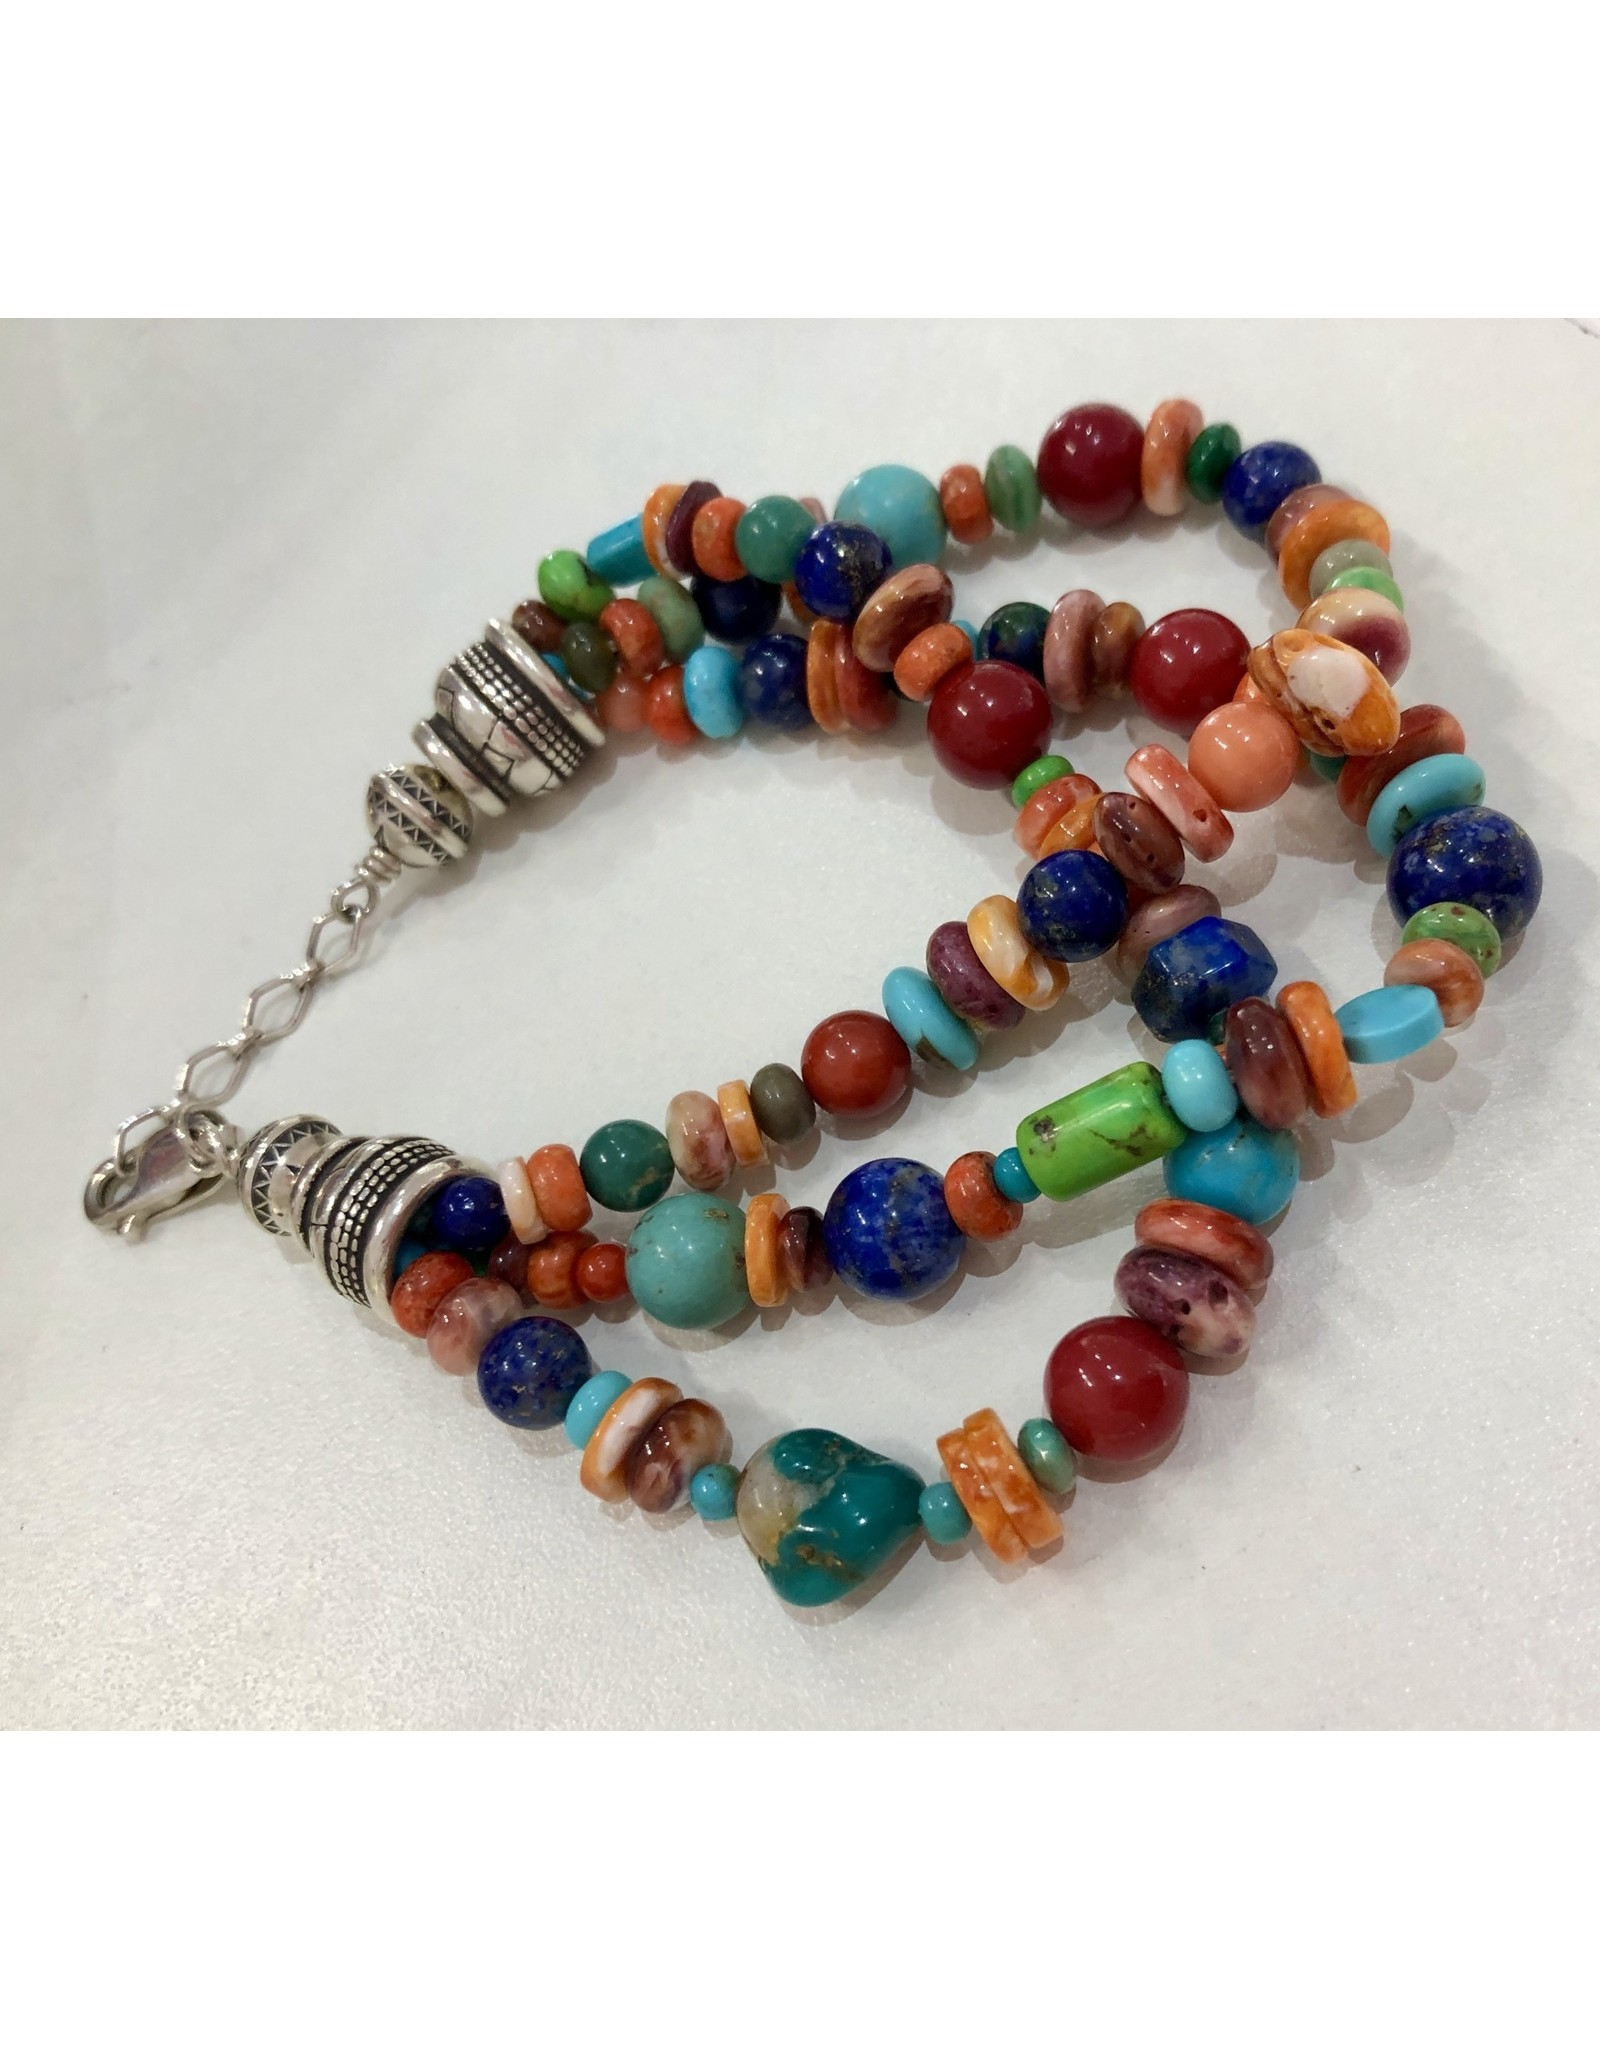 Rare Finds BRACELET, Native American Artist Design, triple strand,